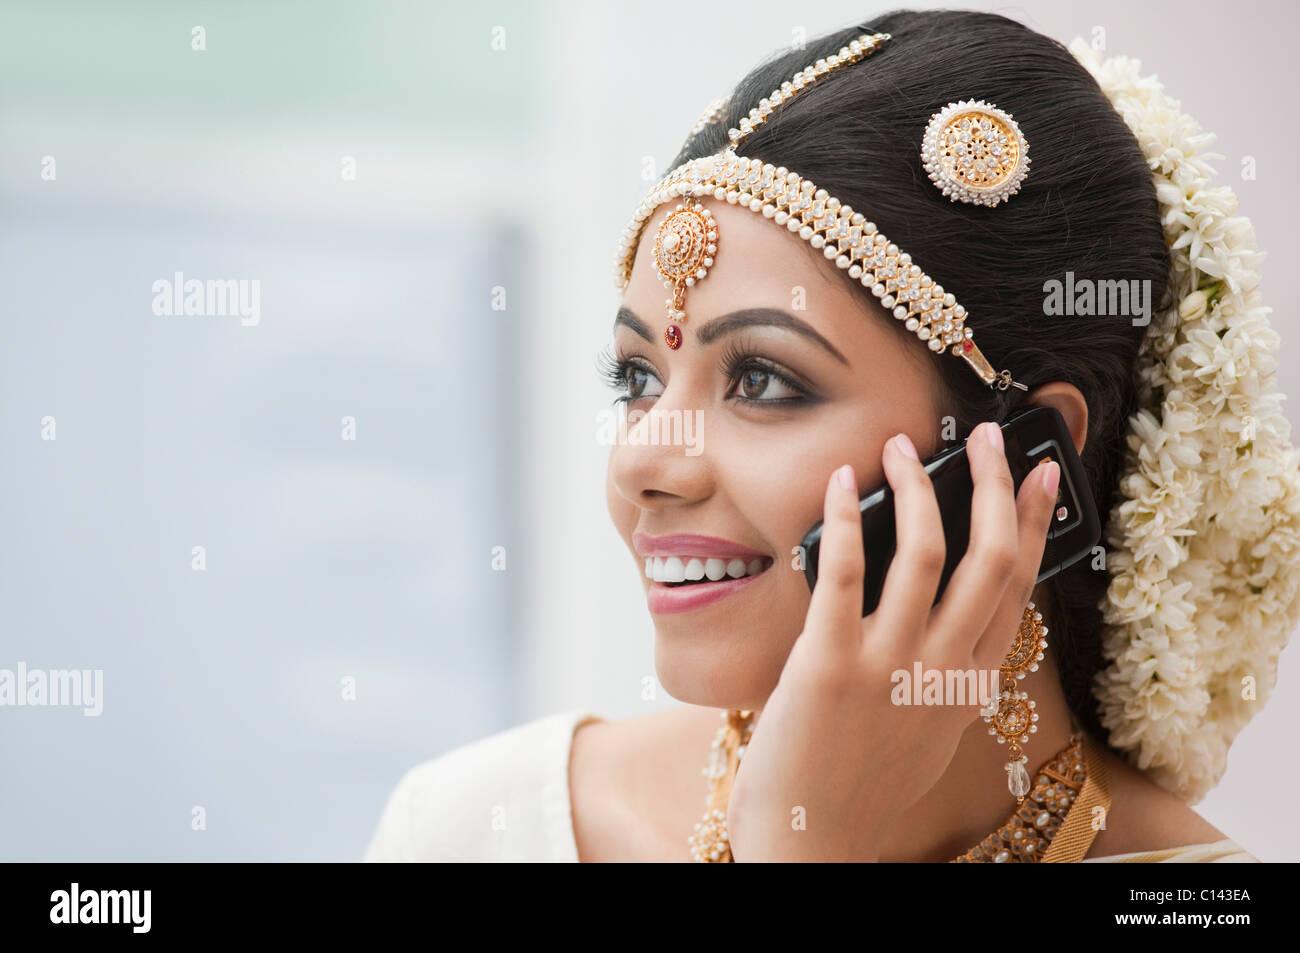 Mariée en robe traditionnelle d'Inde du Sud talking on a mobile phone Photo Stock